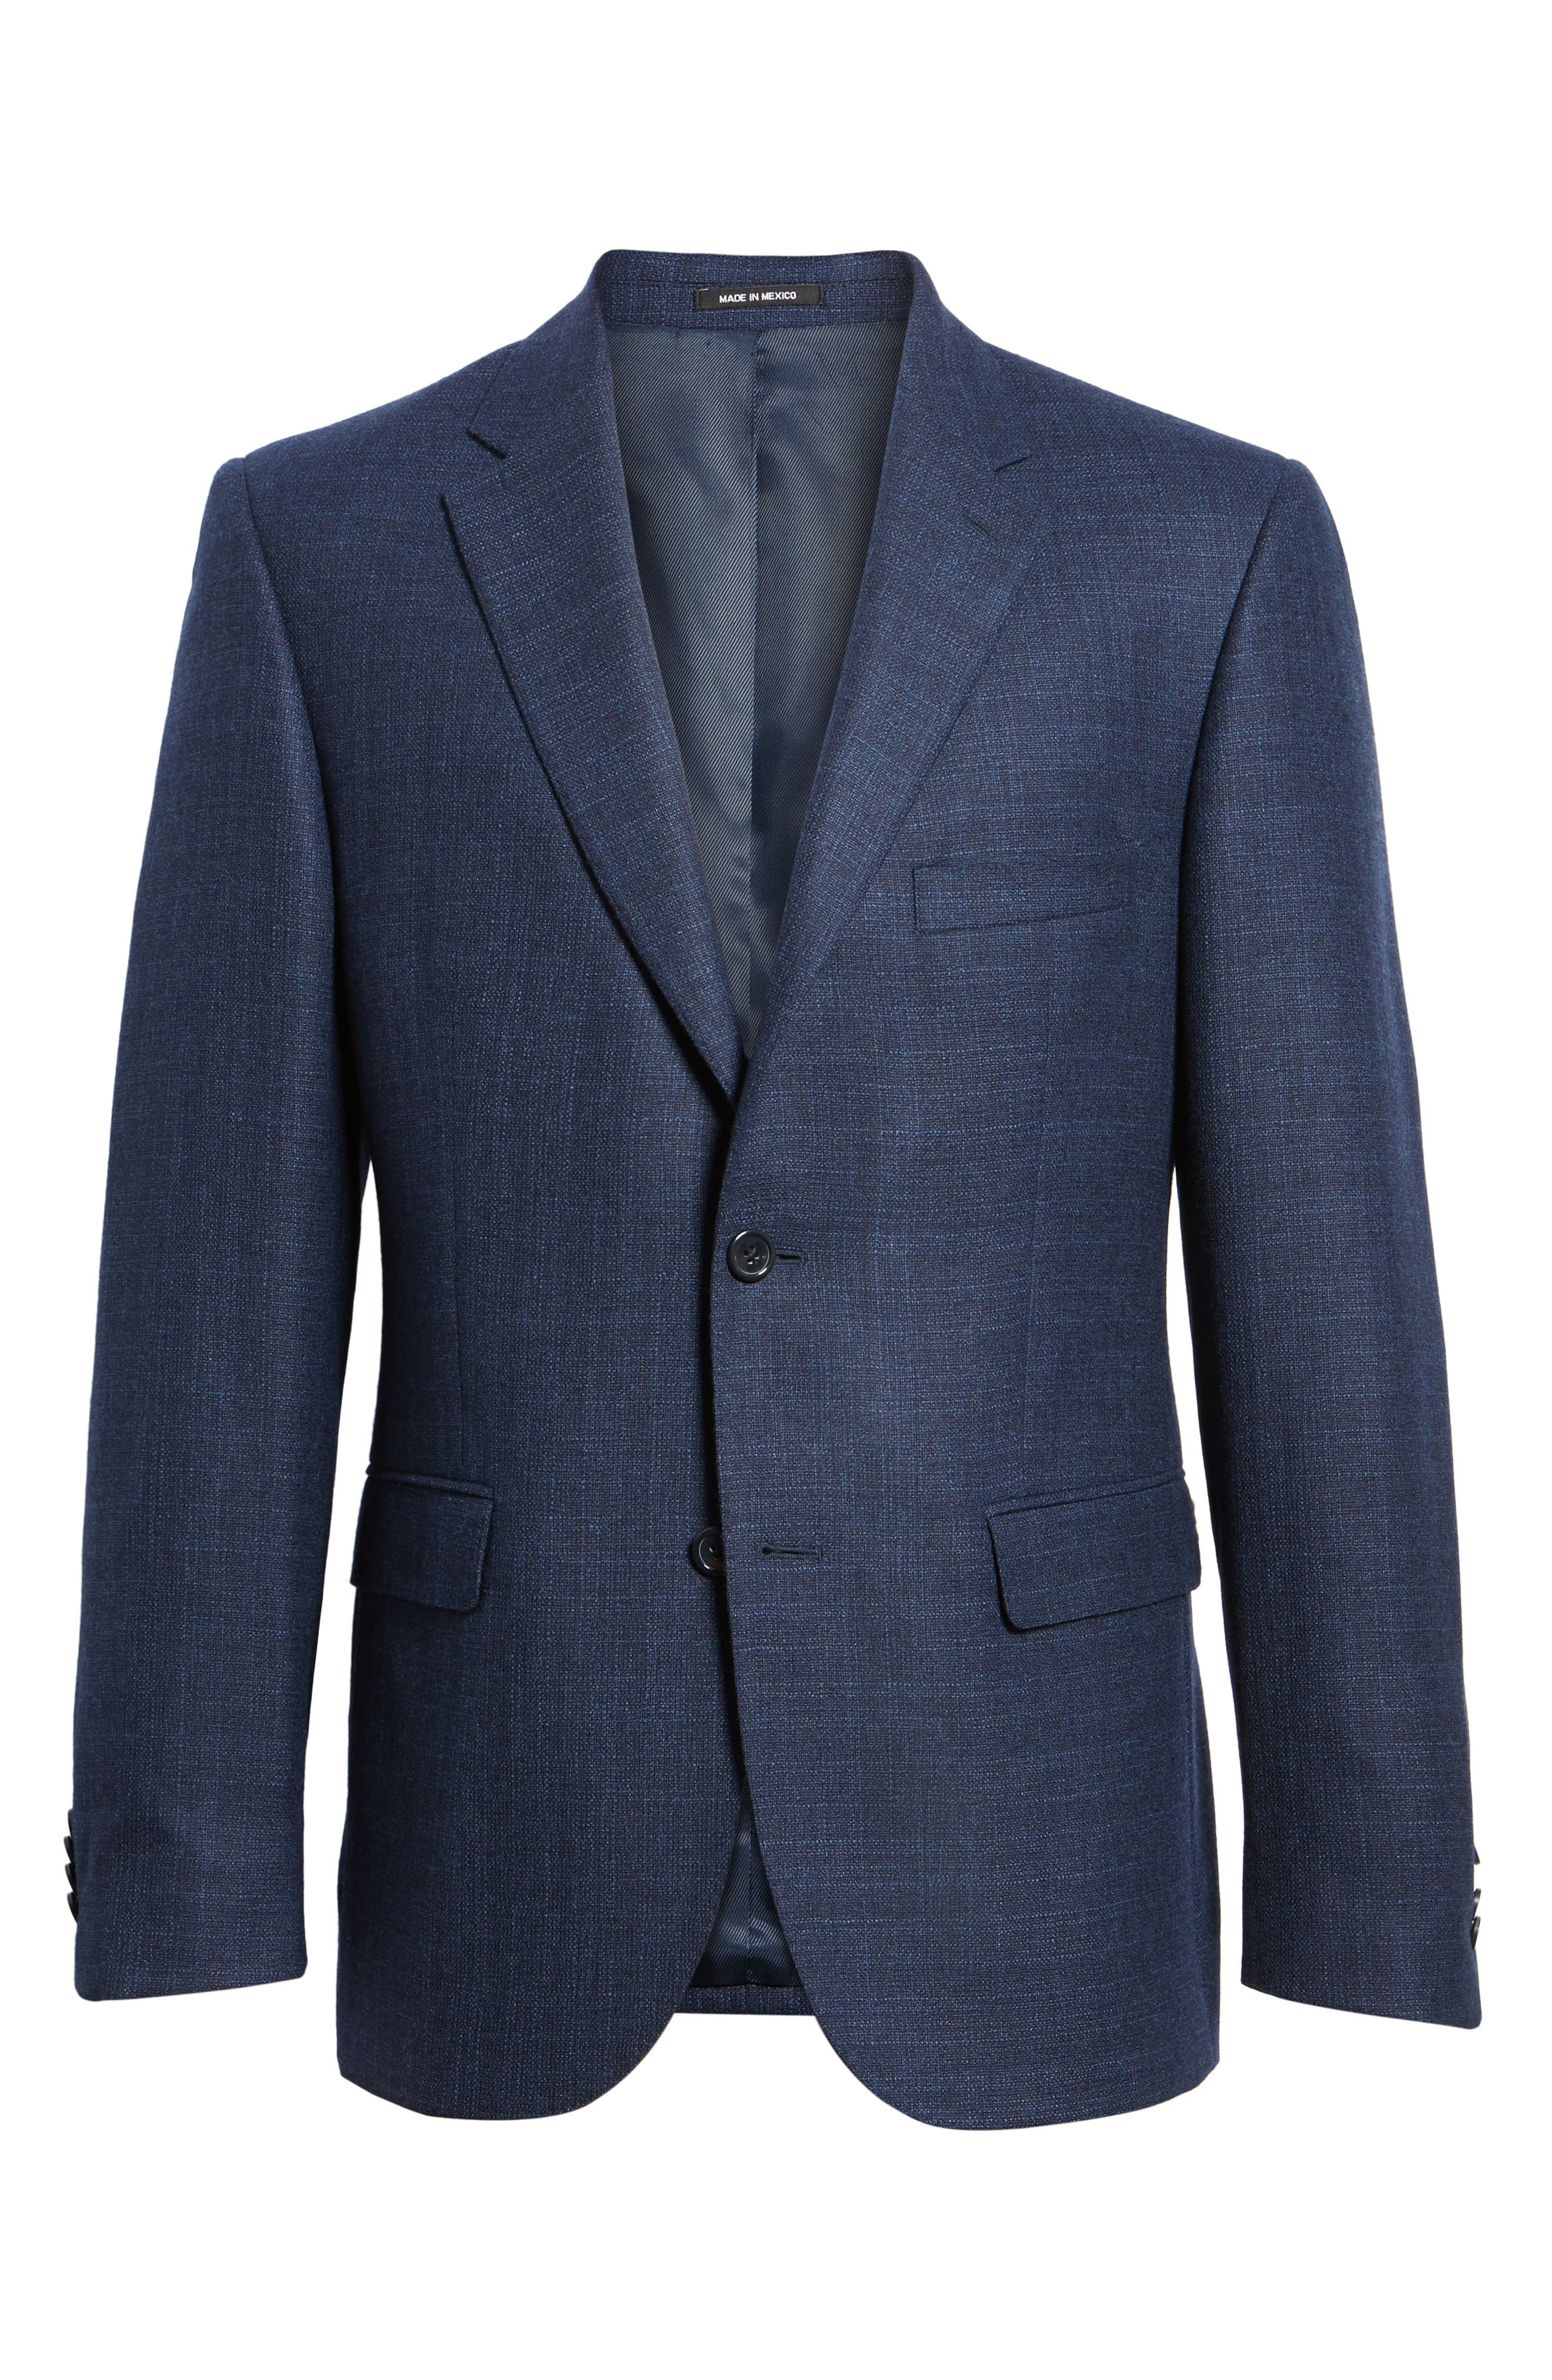 Classic Fit Wool Blazer,                             Alternate thumbnail 6, color,                             Blue